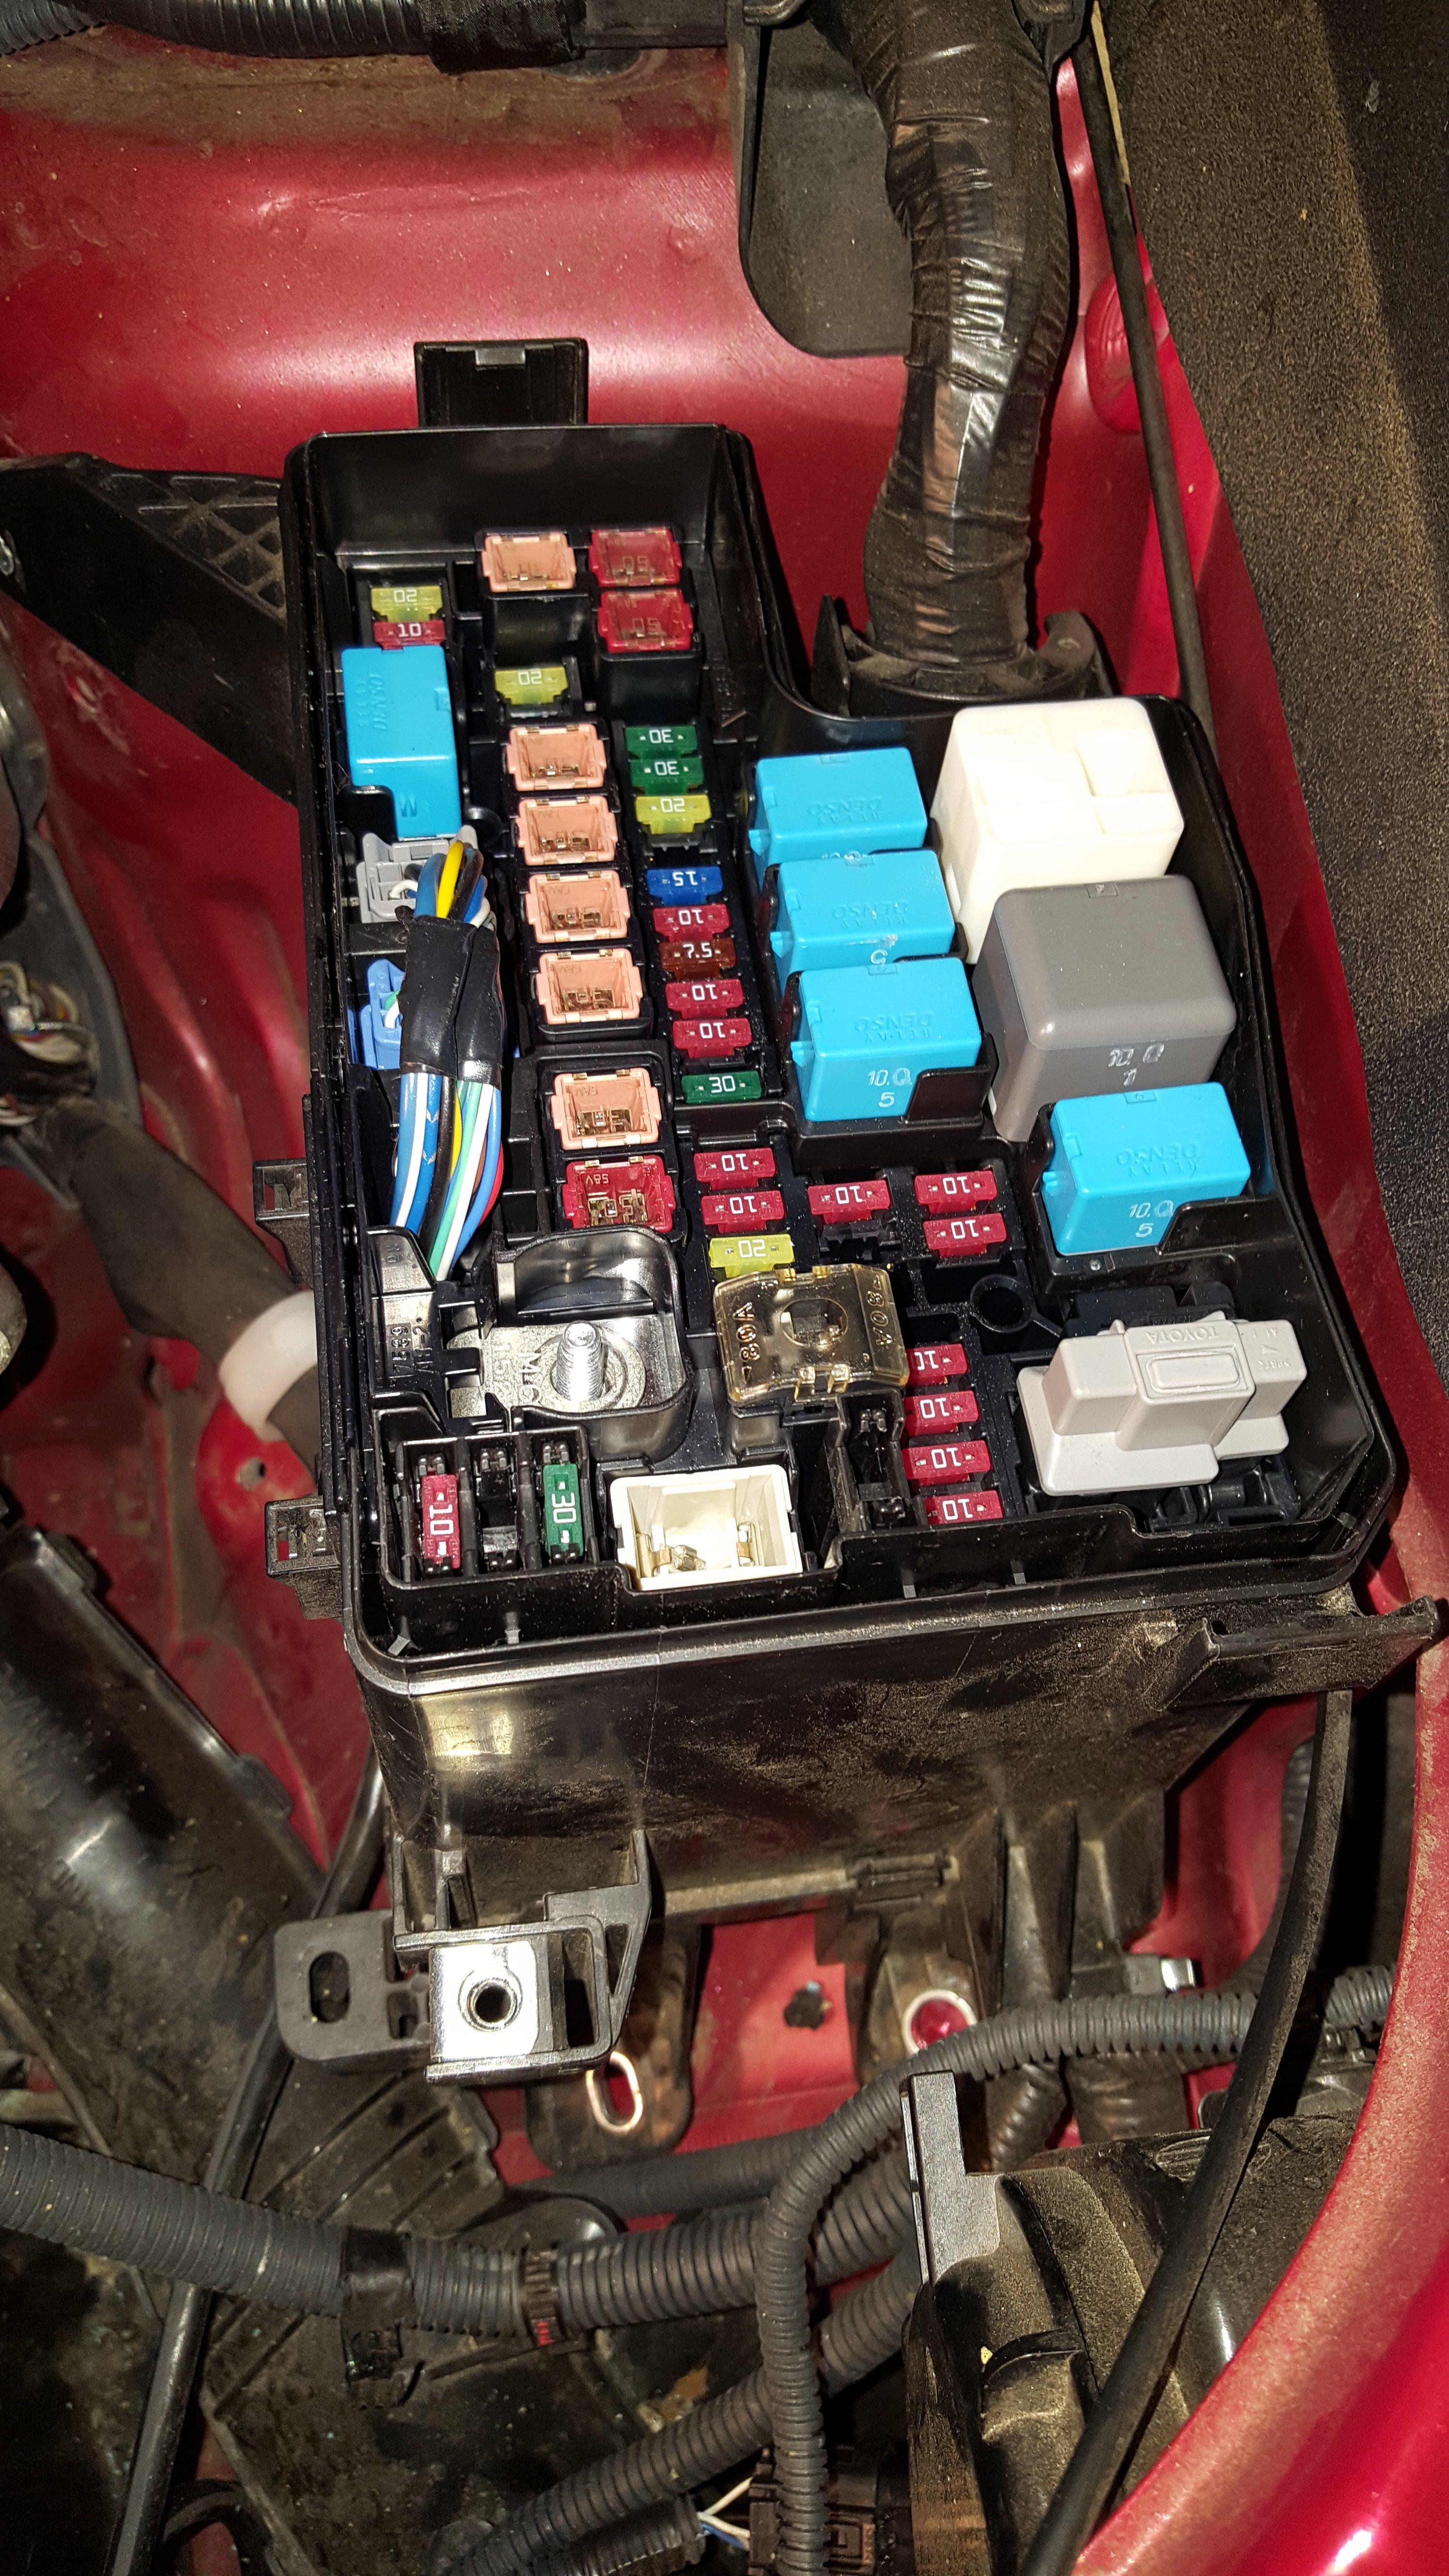 2013 Rav4 Fuse Box Trusted Wiring Diagrams 2002 120 Alt Diagram Electricity Basics 101 U2022 Jetta